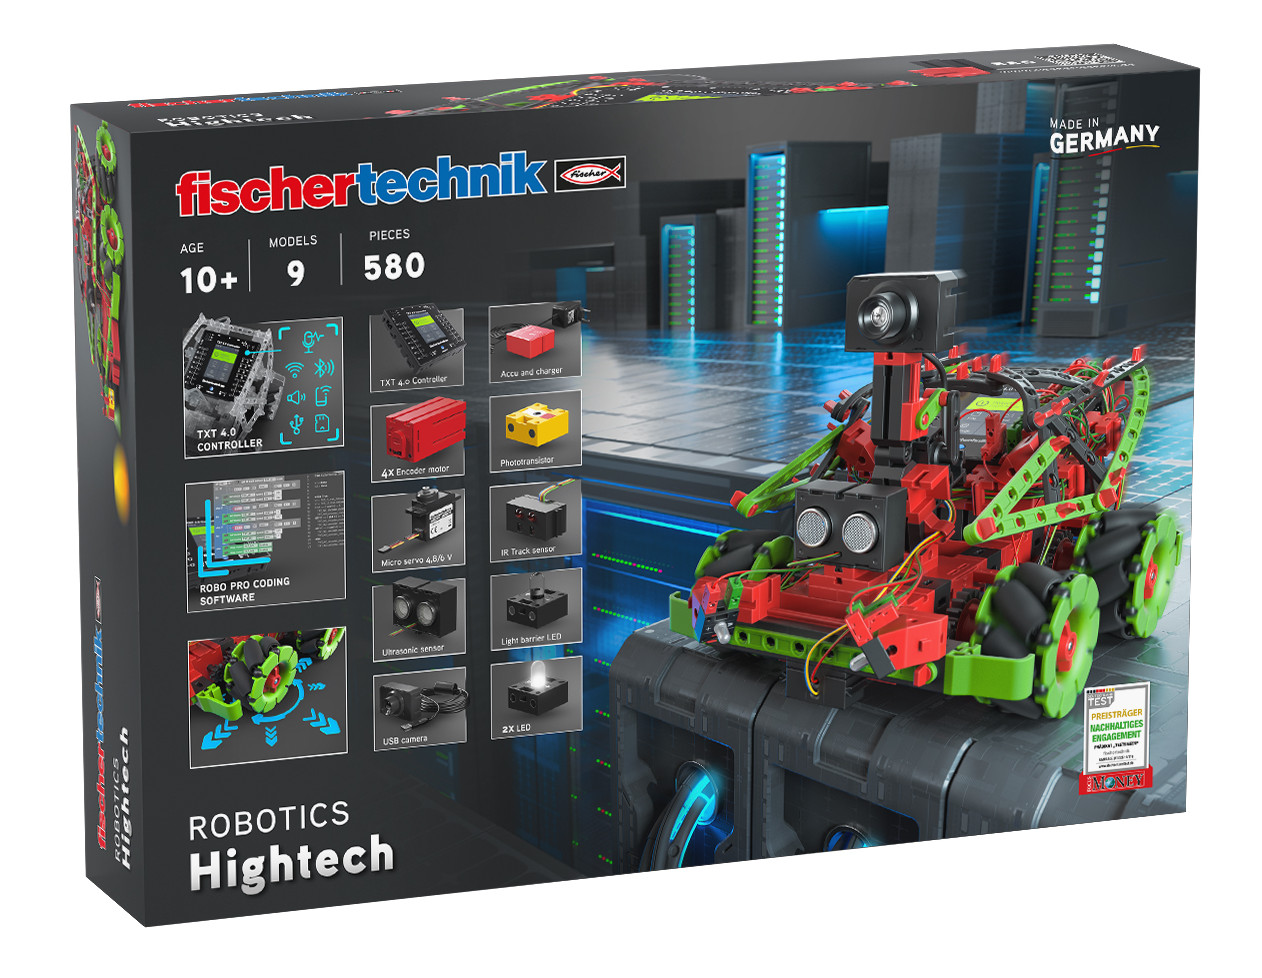 559895 Robotics Hightech